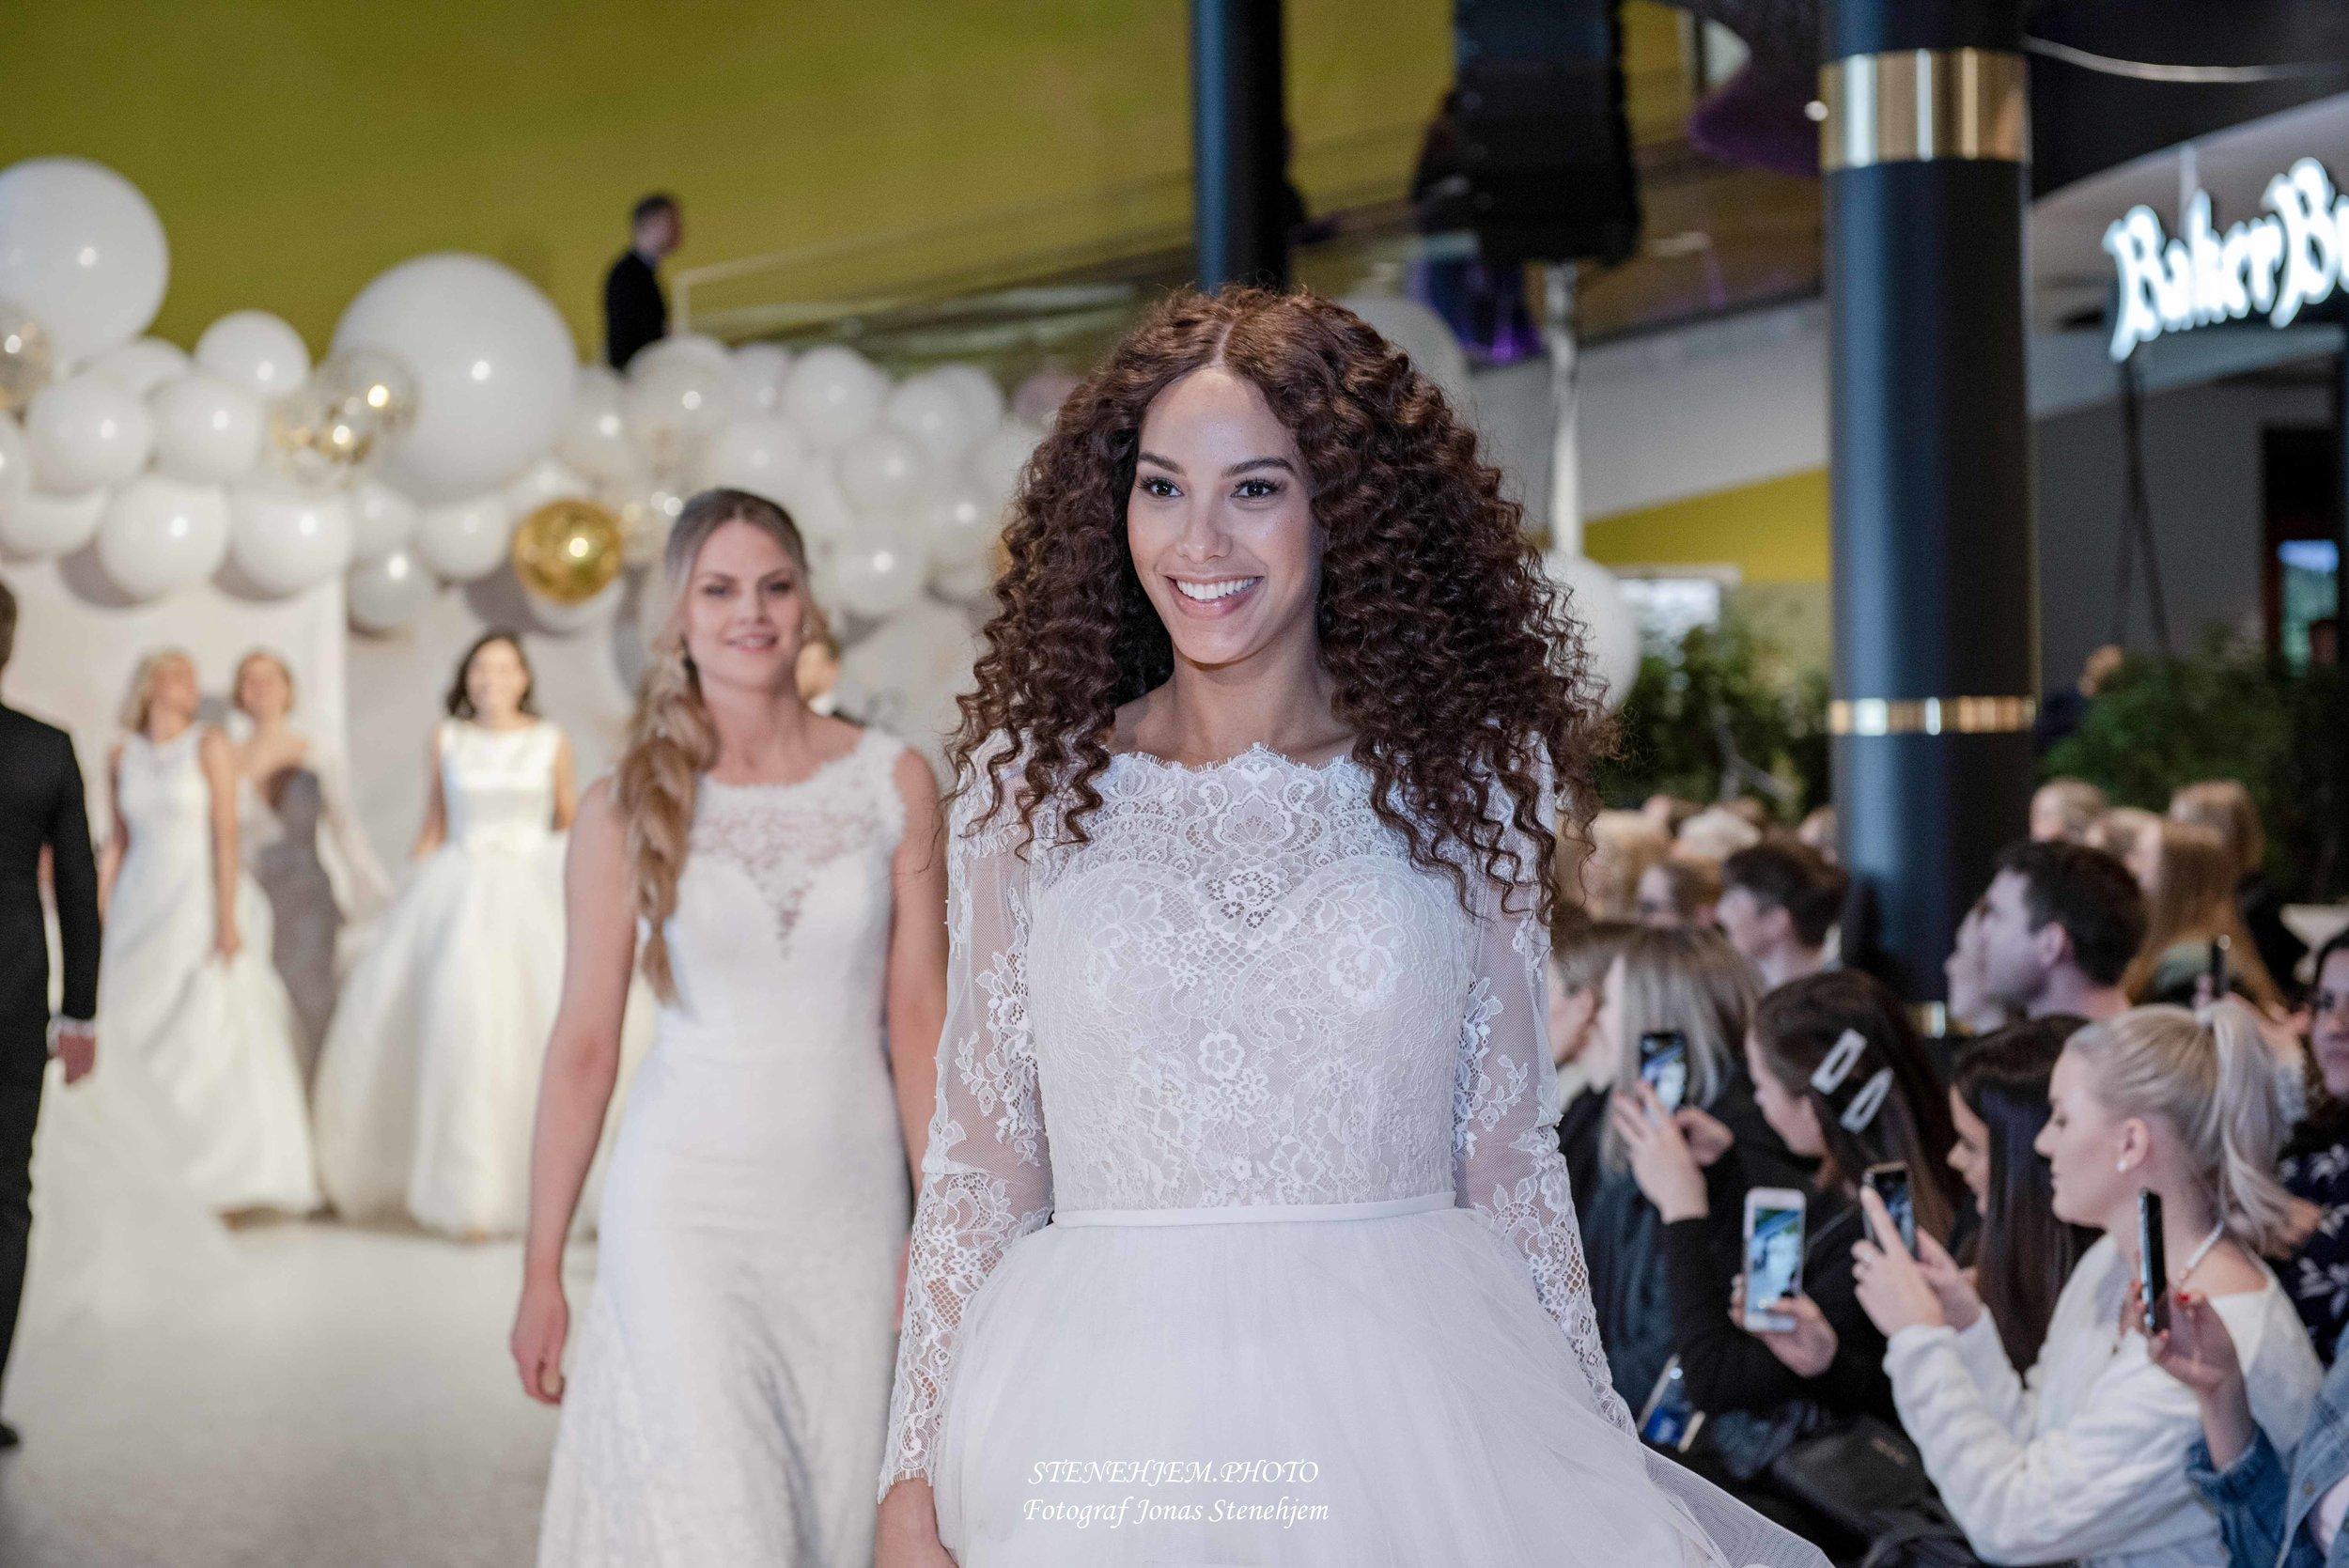 Bryllupsmesse_Lagunen_mittaltweddingfair__094.jpg